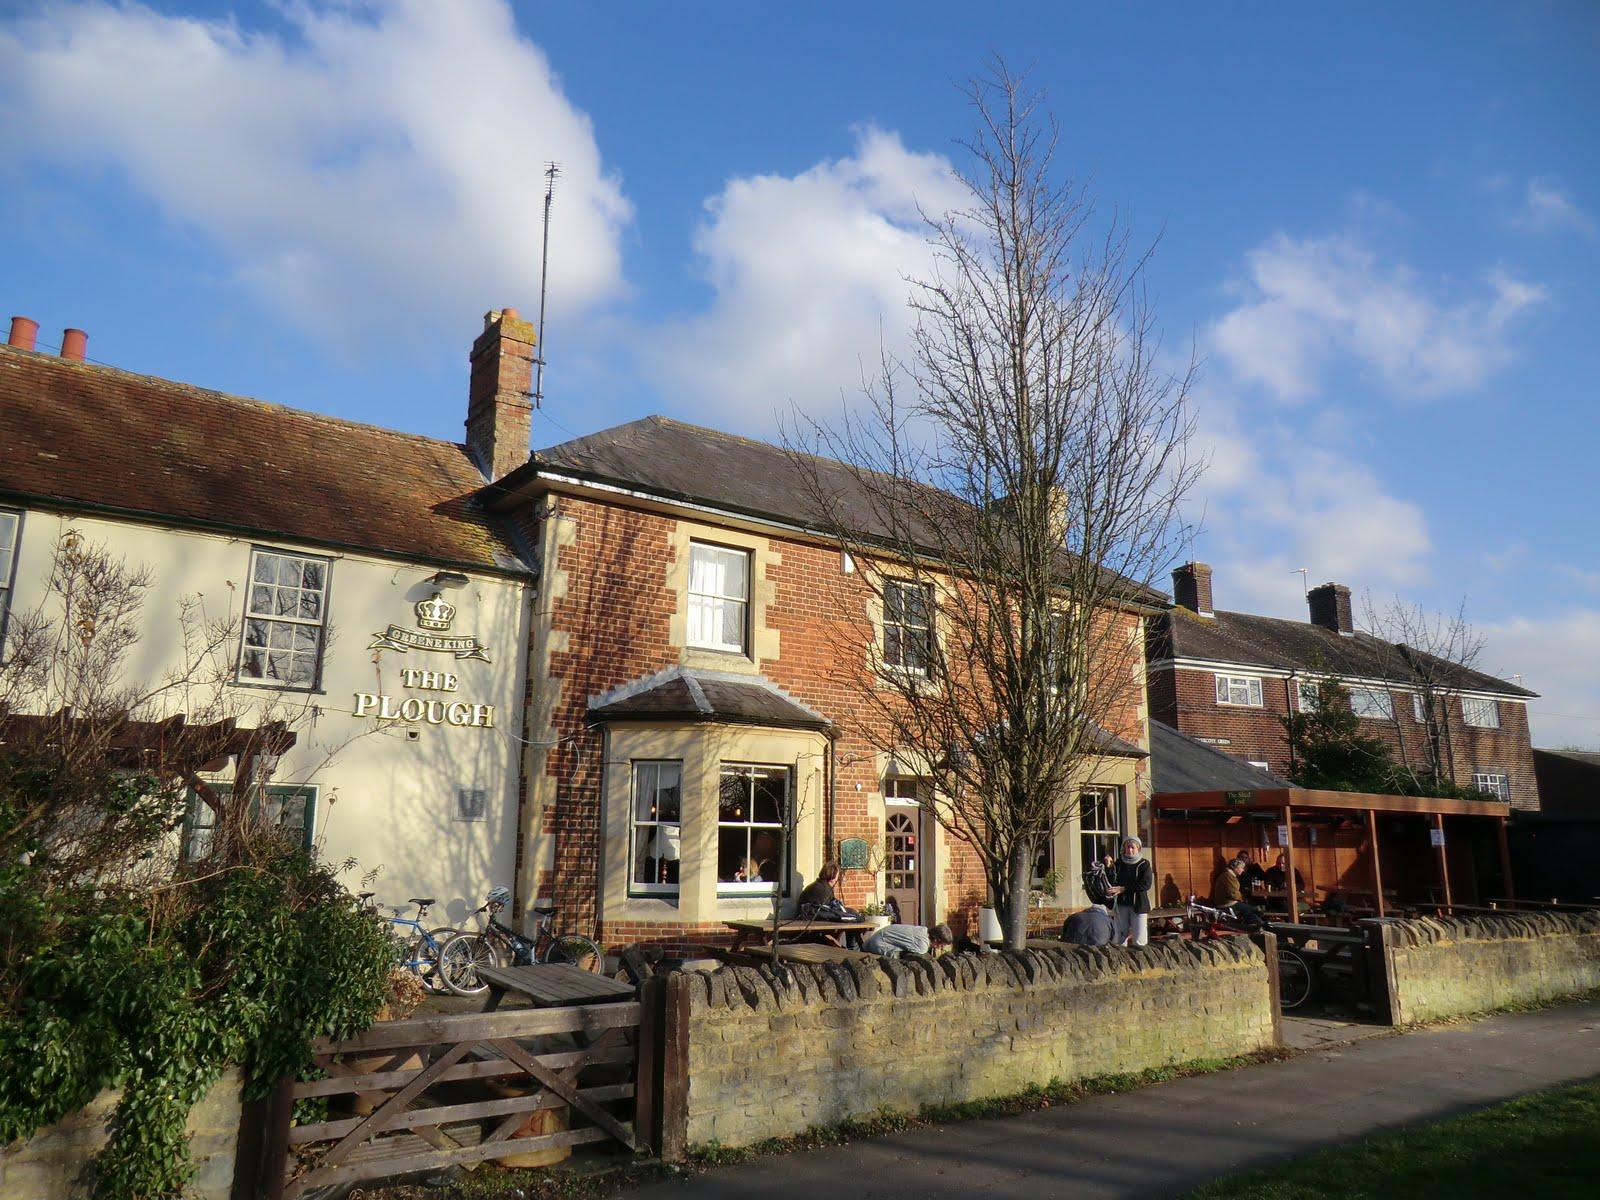 CIMG1516 The Plough Inn, Wolvercote Green